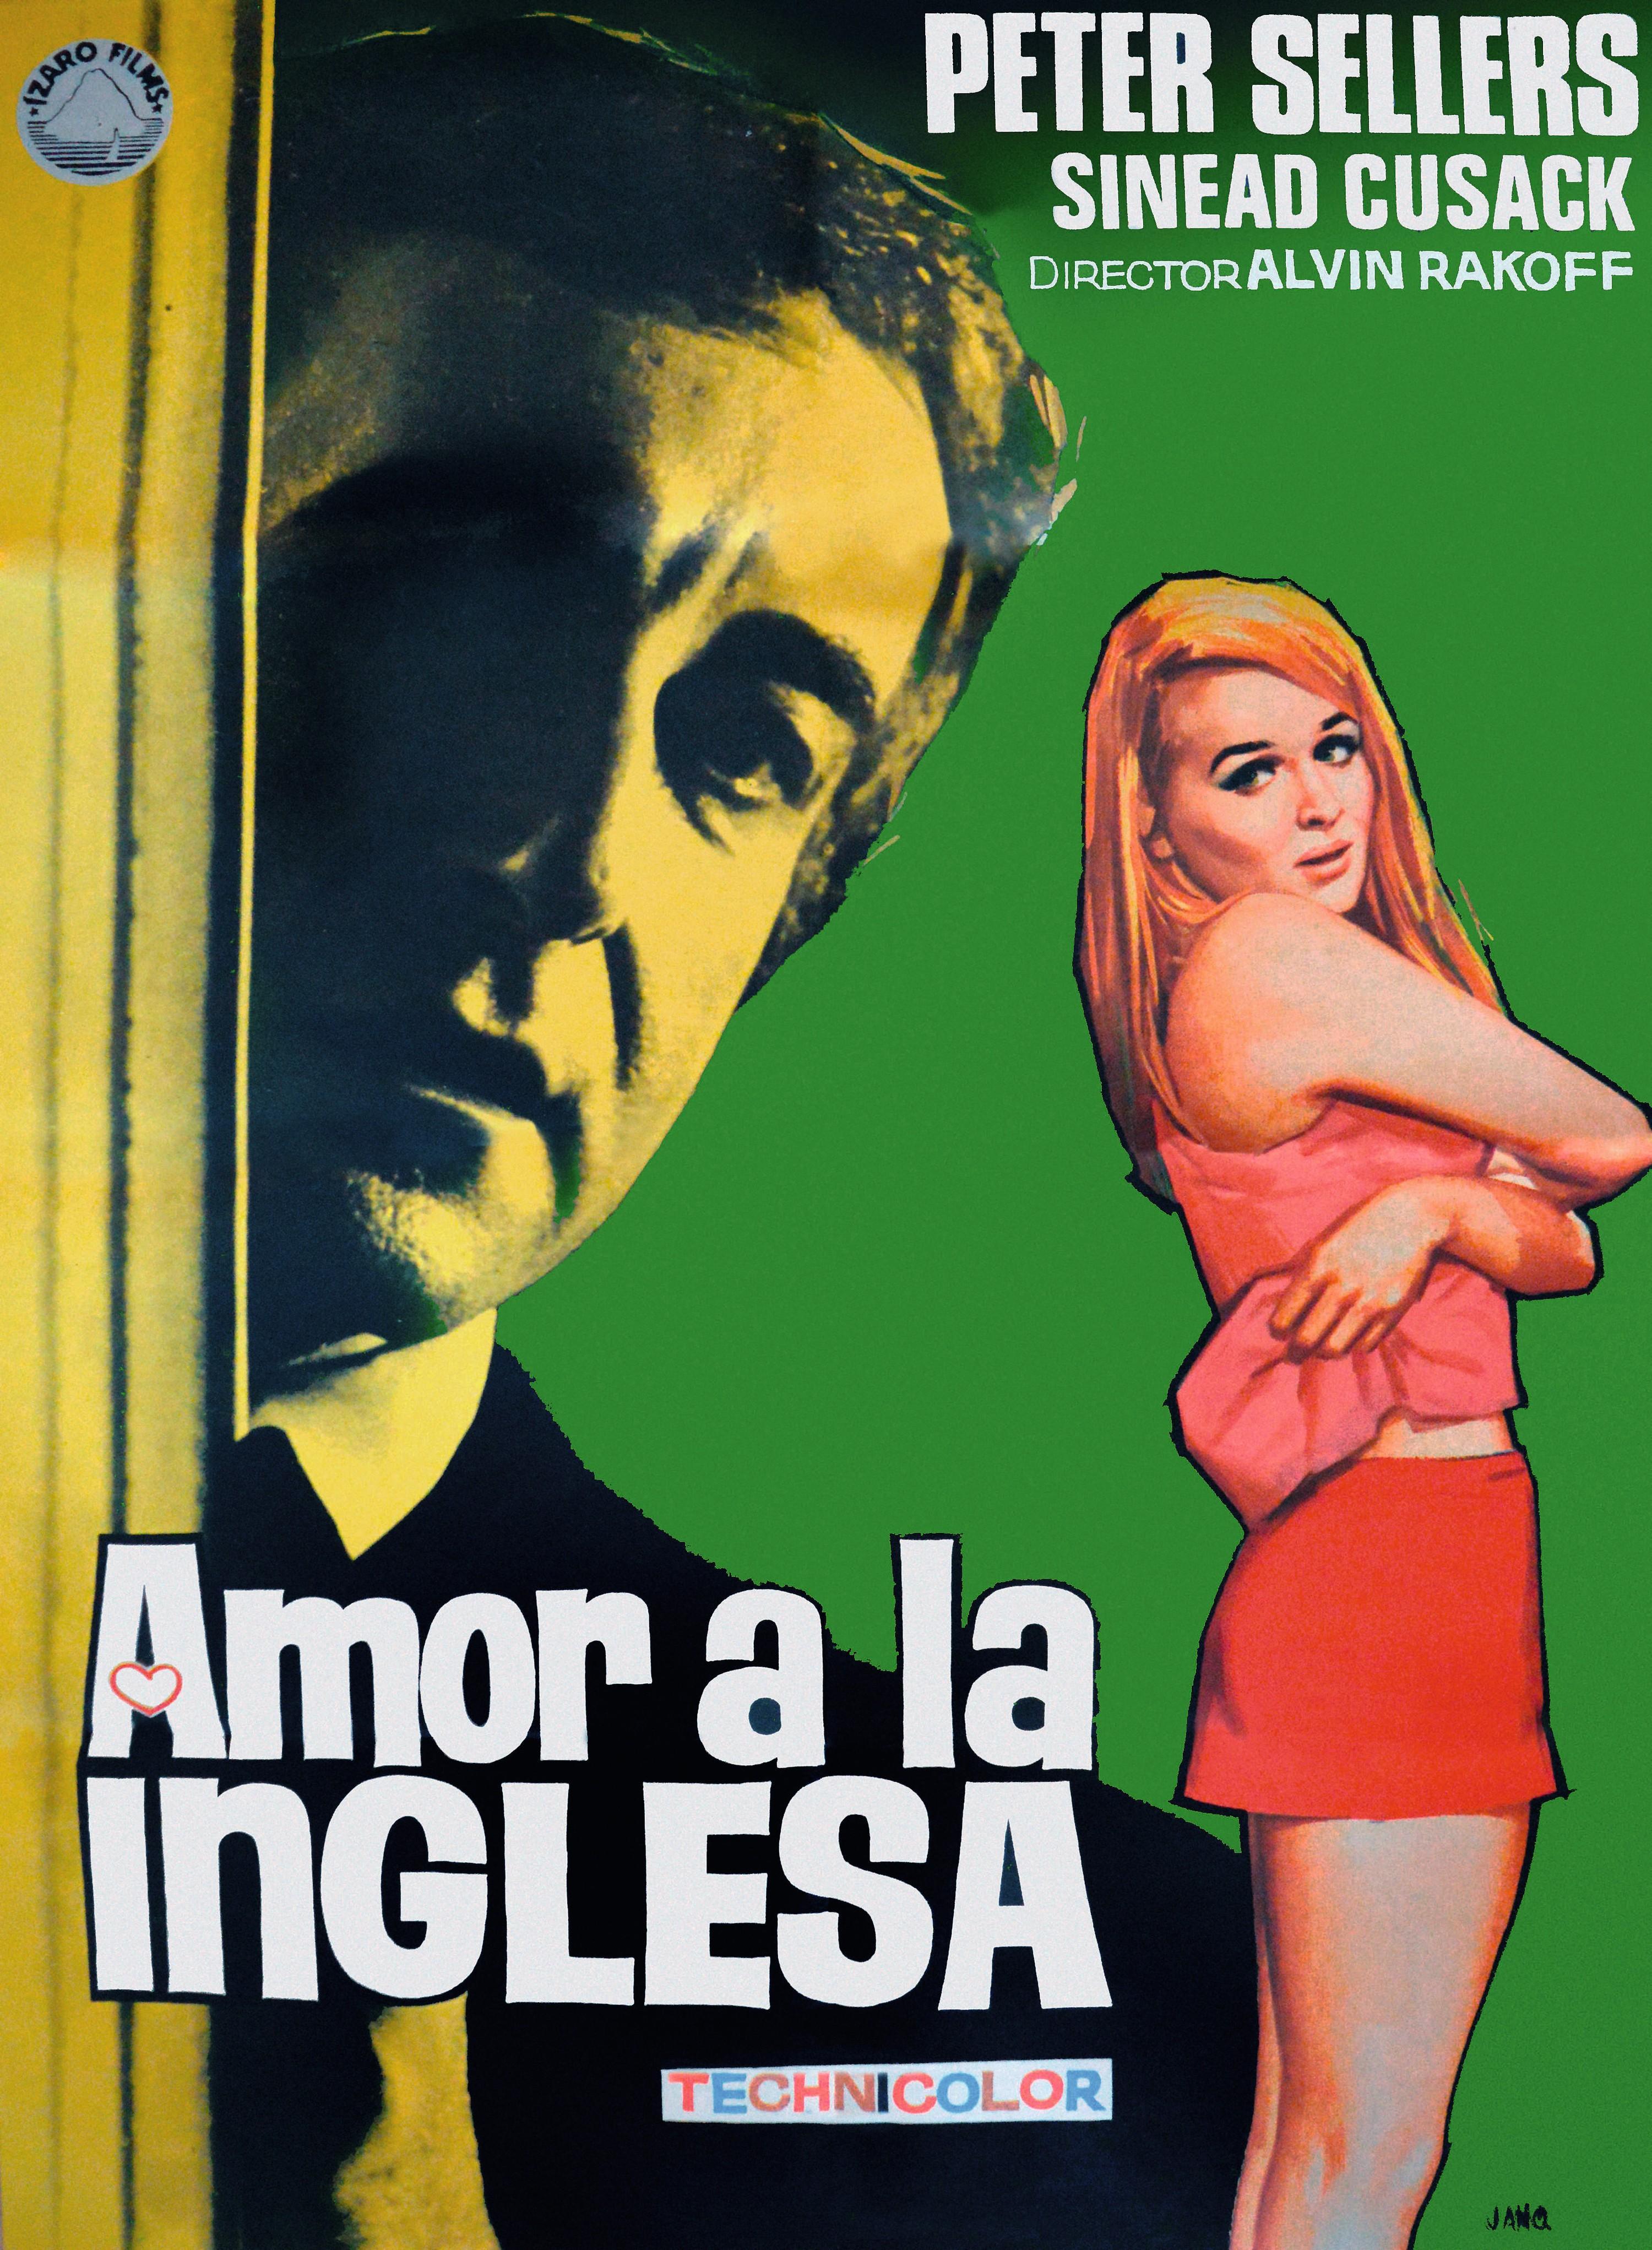 Cartel español para la película Amor a la inglesa,  Alvin Rakoff, 1970.